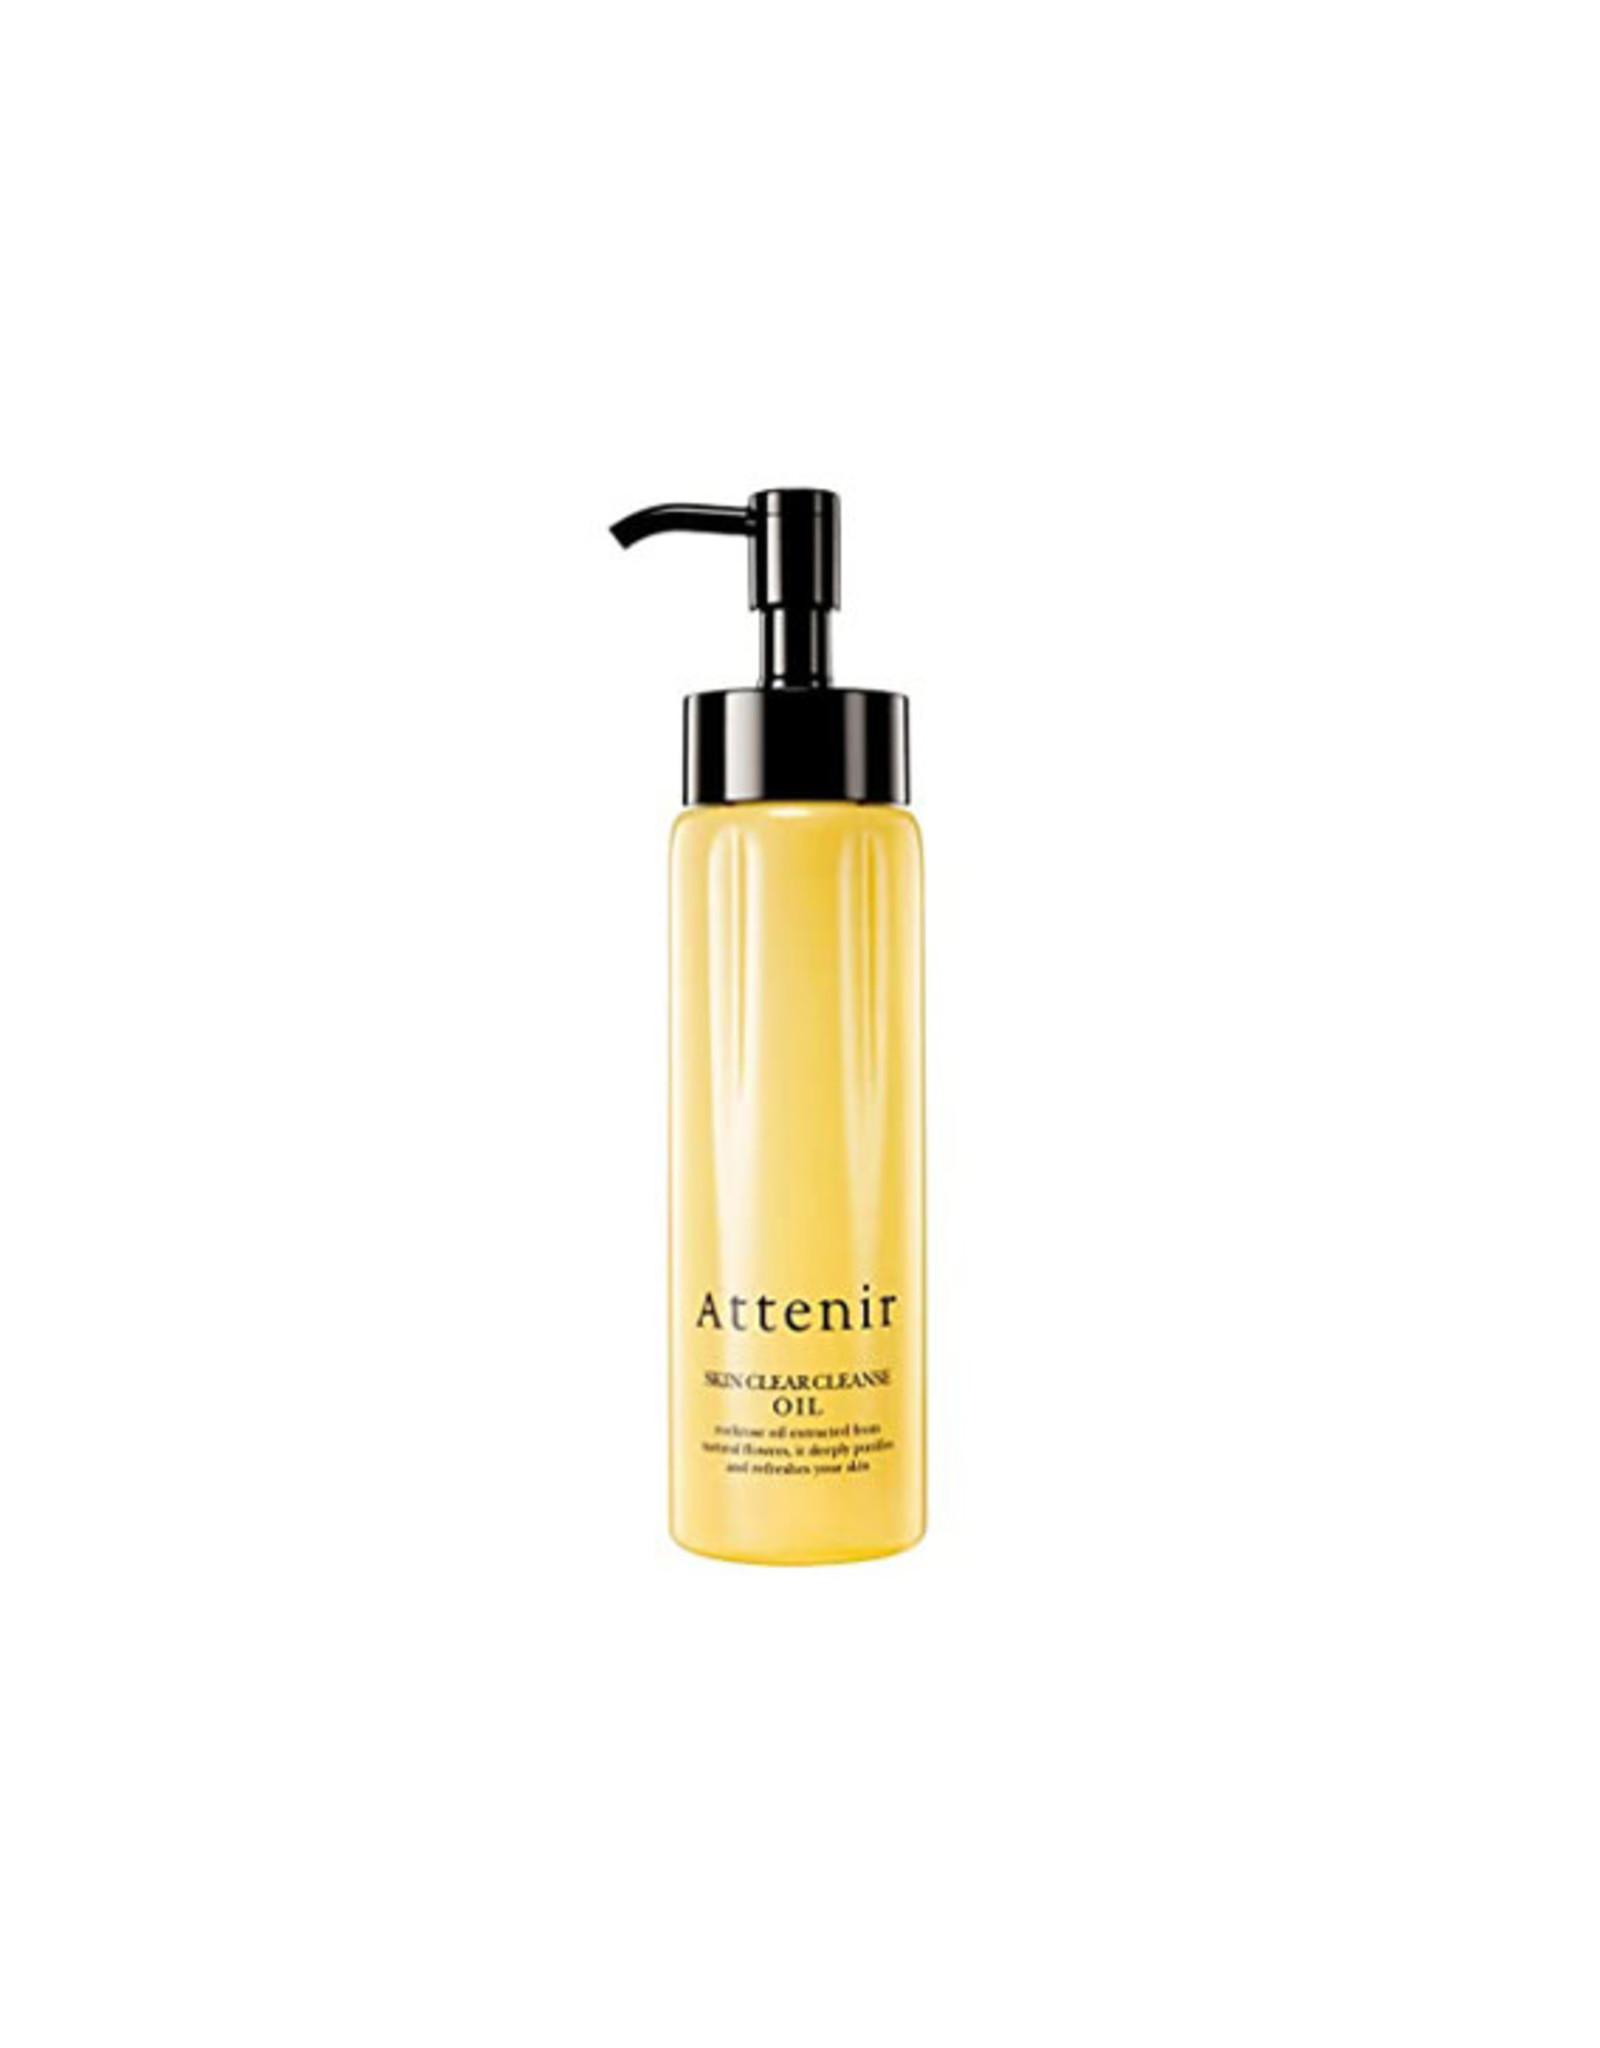 Attenir Attenir Skin Clear Cleanse Oil W/ Light Citrus Relaxing Aroma